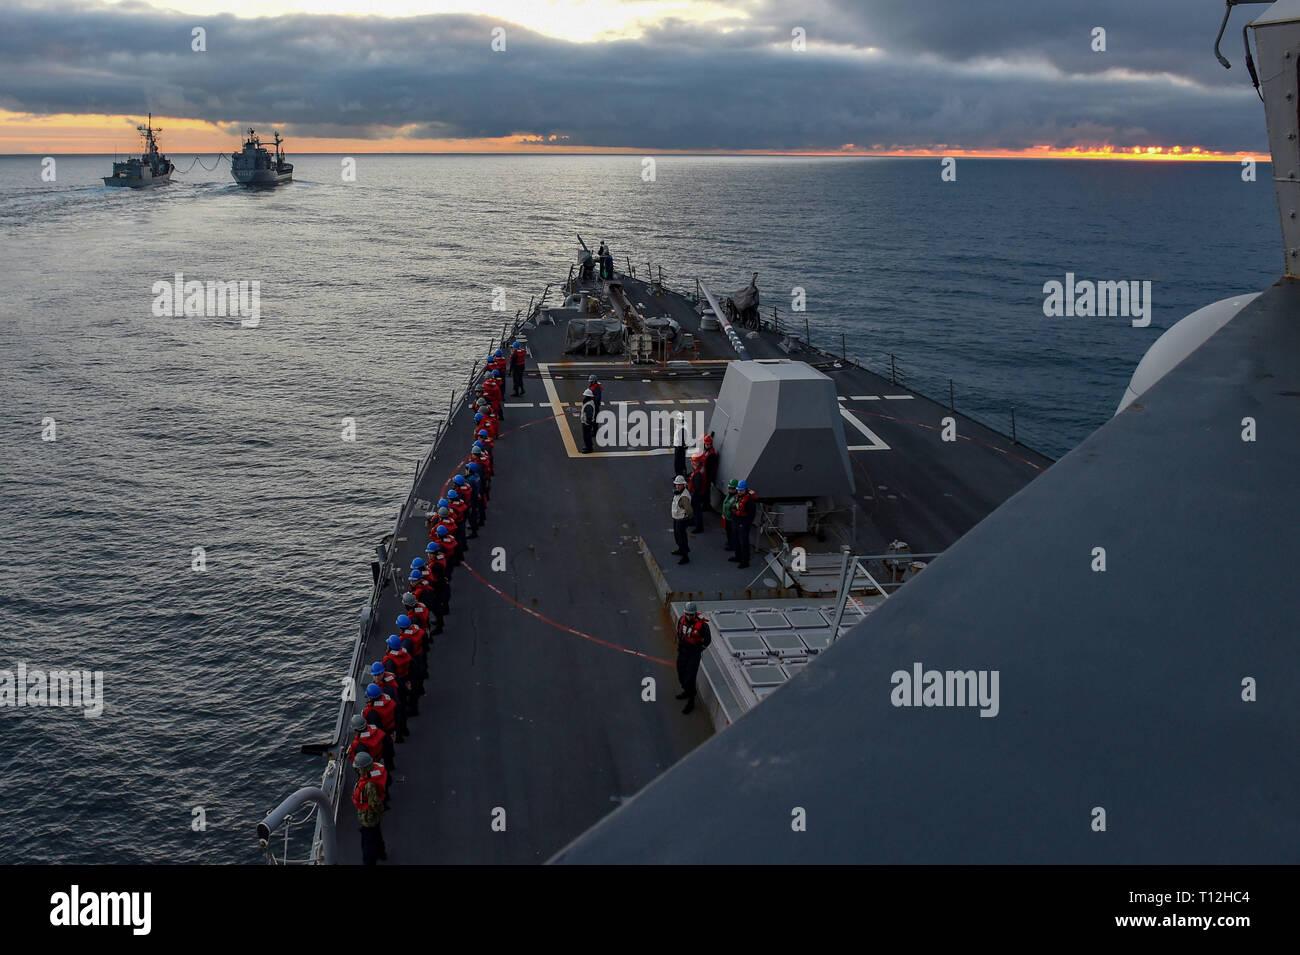 190321-N-JX484-242 ENGLISH CHANNEL (Mar  21, 2019) Sailors man the